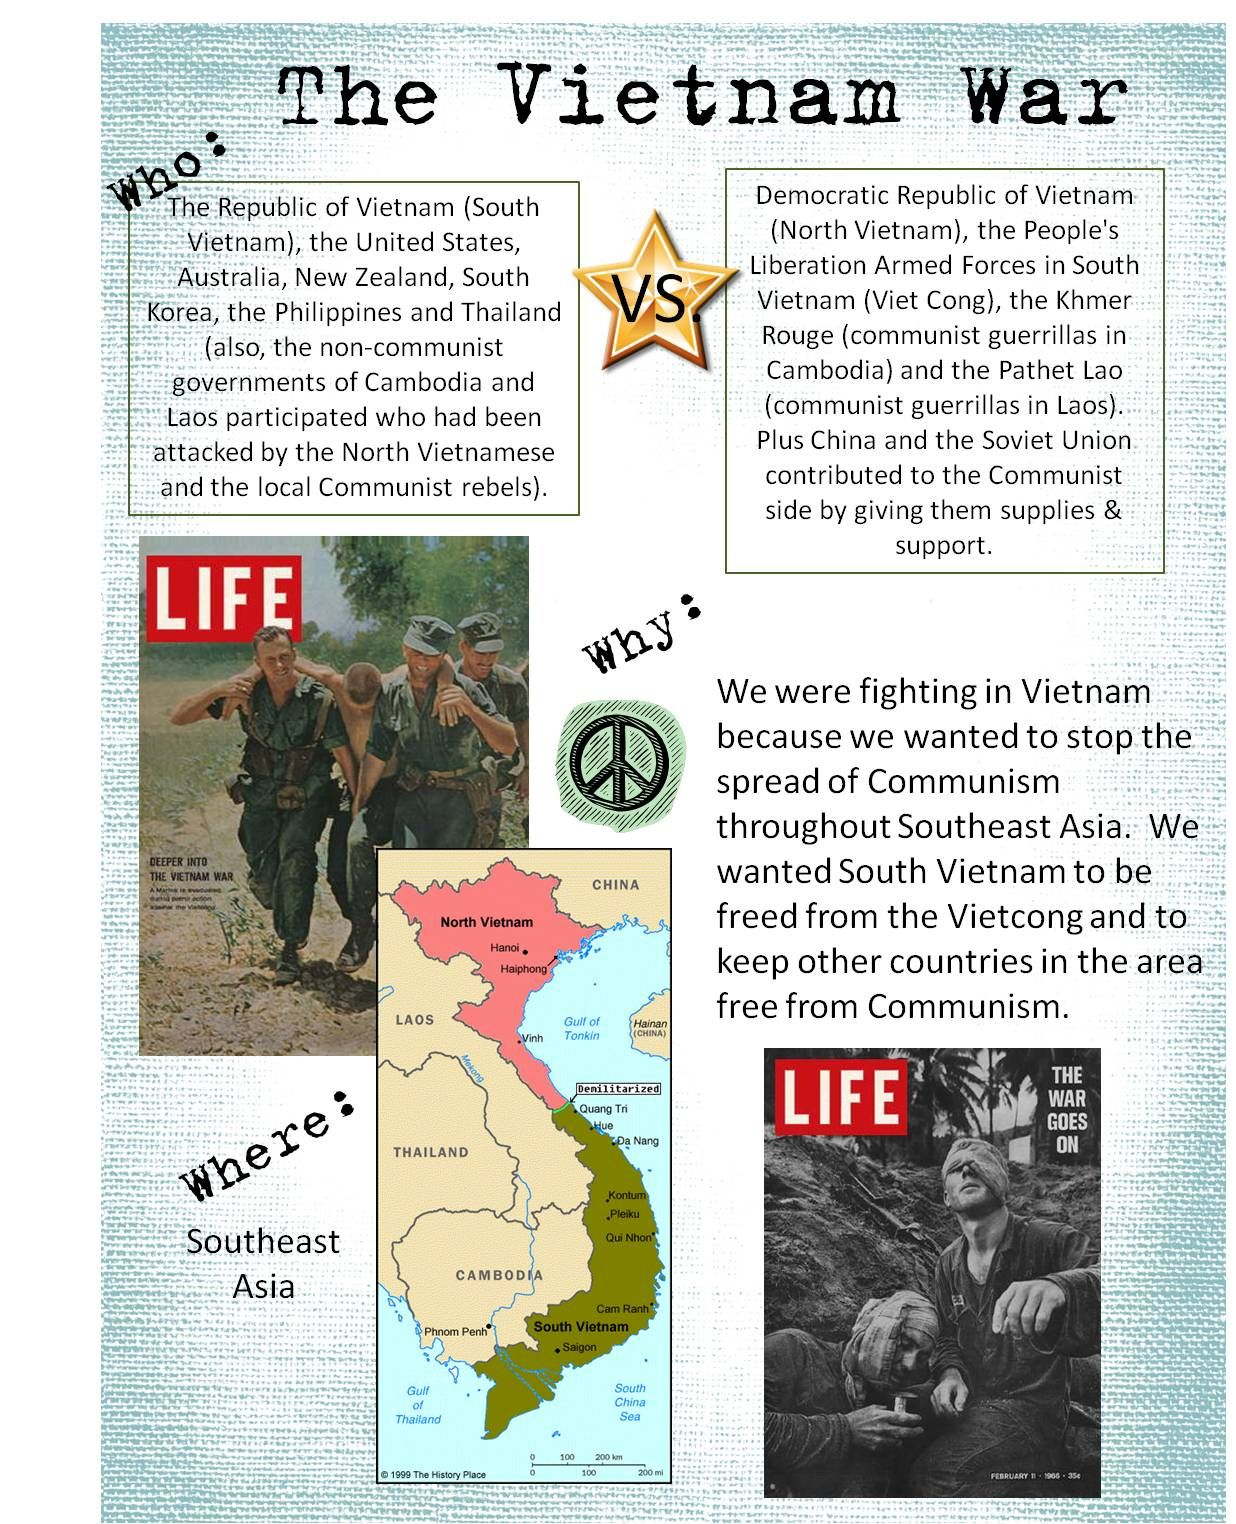 worksheet Vietnam War Worksheet my junior high age son did an awesome scrapbook project on the vietnam war